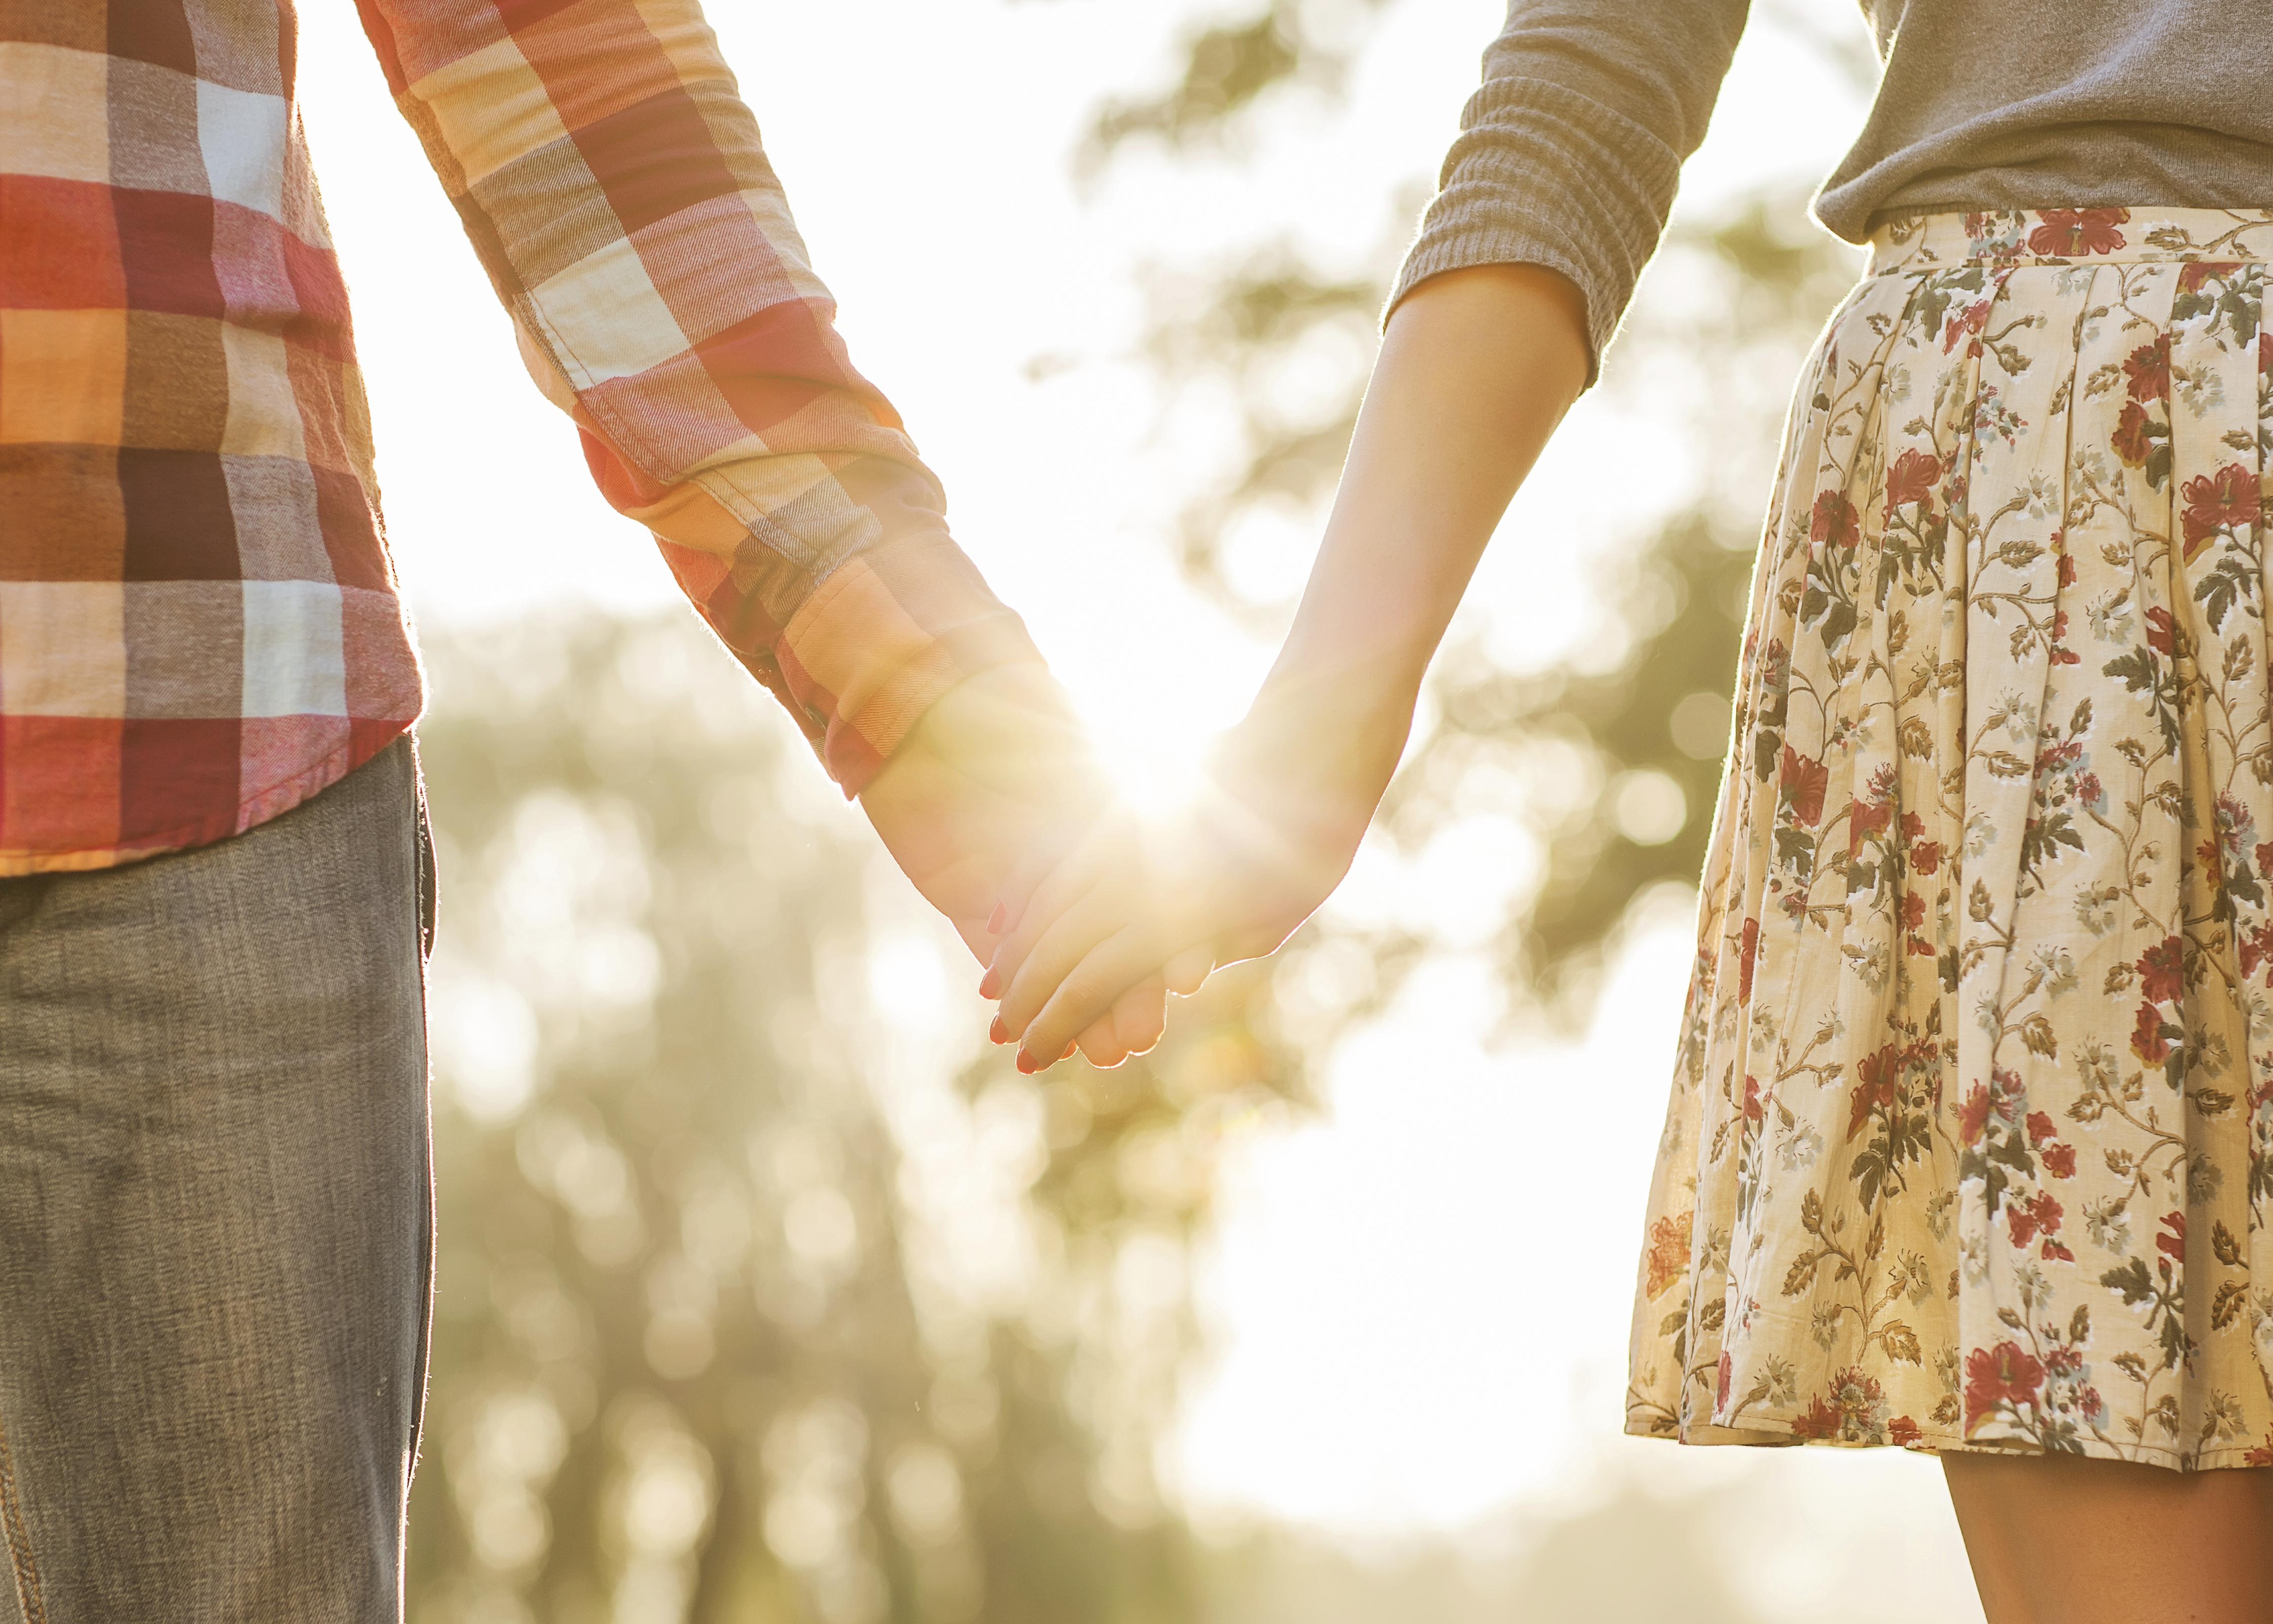 Rethinking monogamy: Relationship expert discusses evolving paradigm